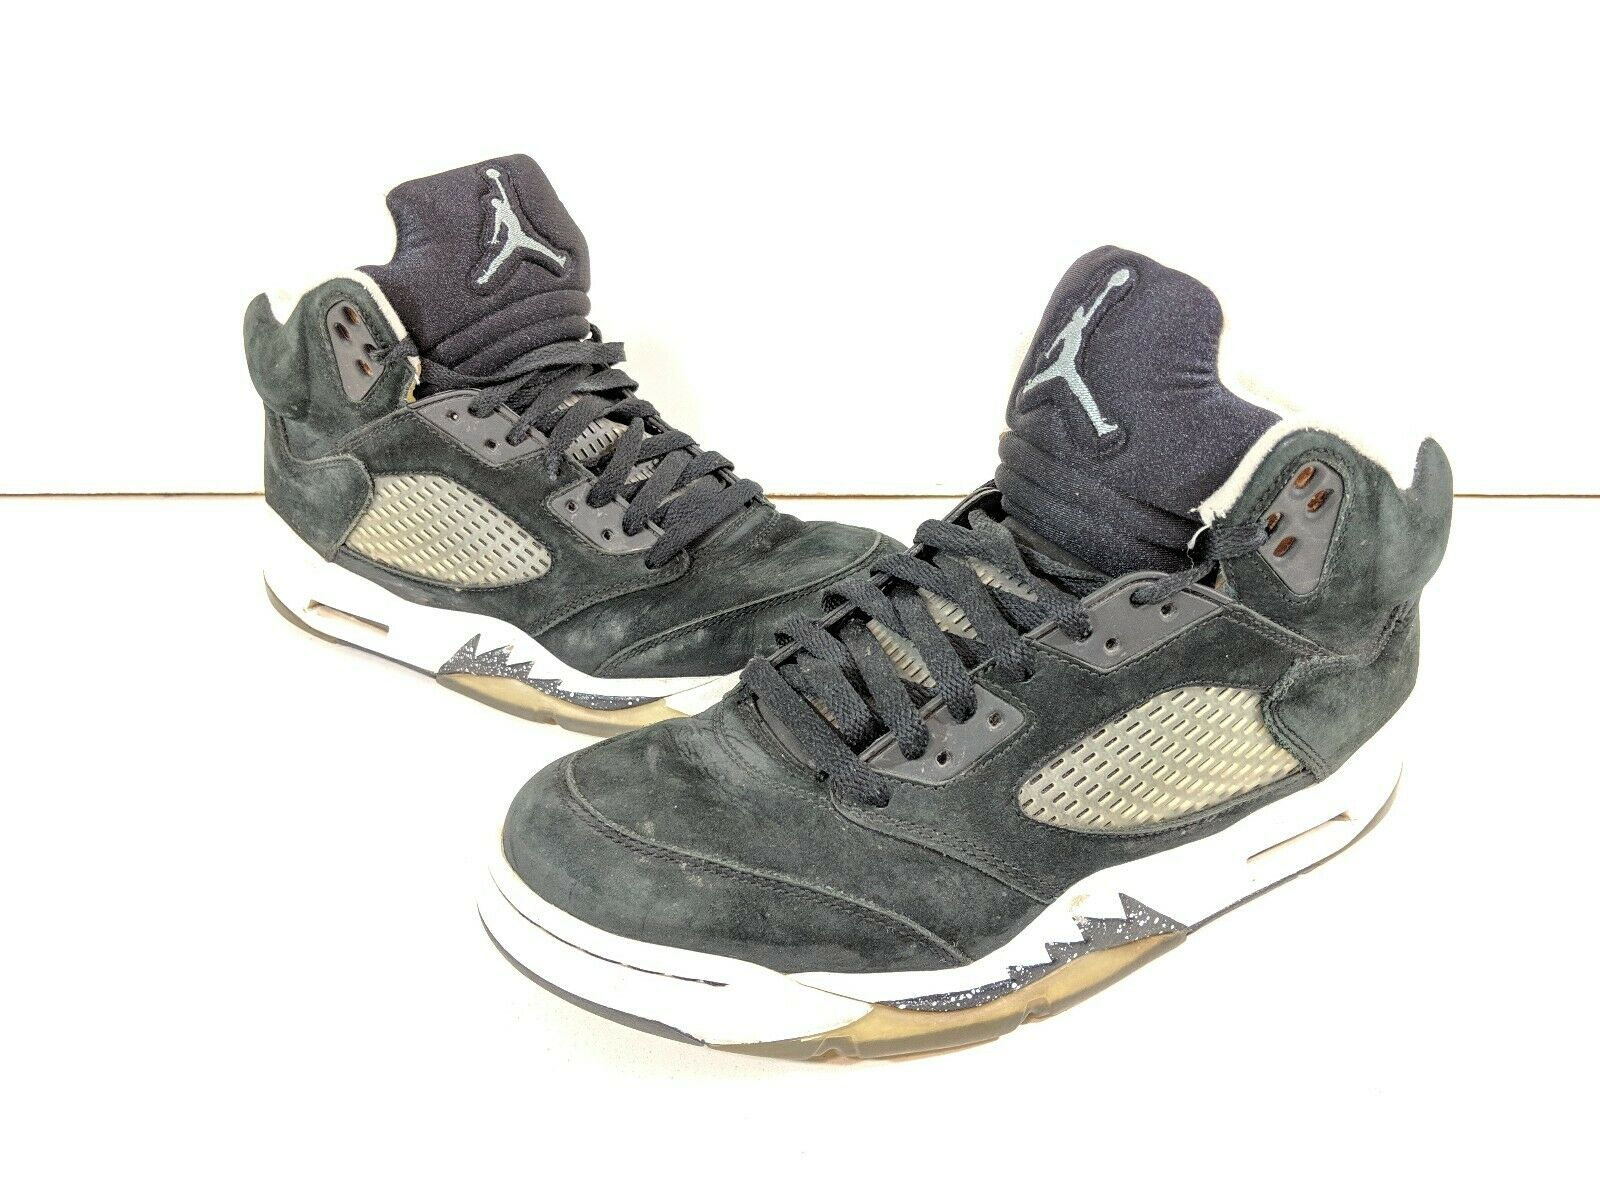 2013 Nike Air Jordan 5 Retro  Oreo  Blk Cool Grey Wht Sz 9 136027-035